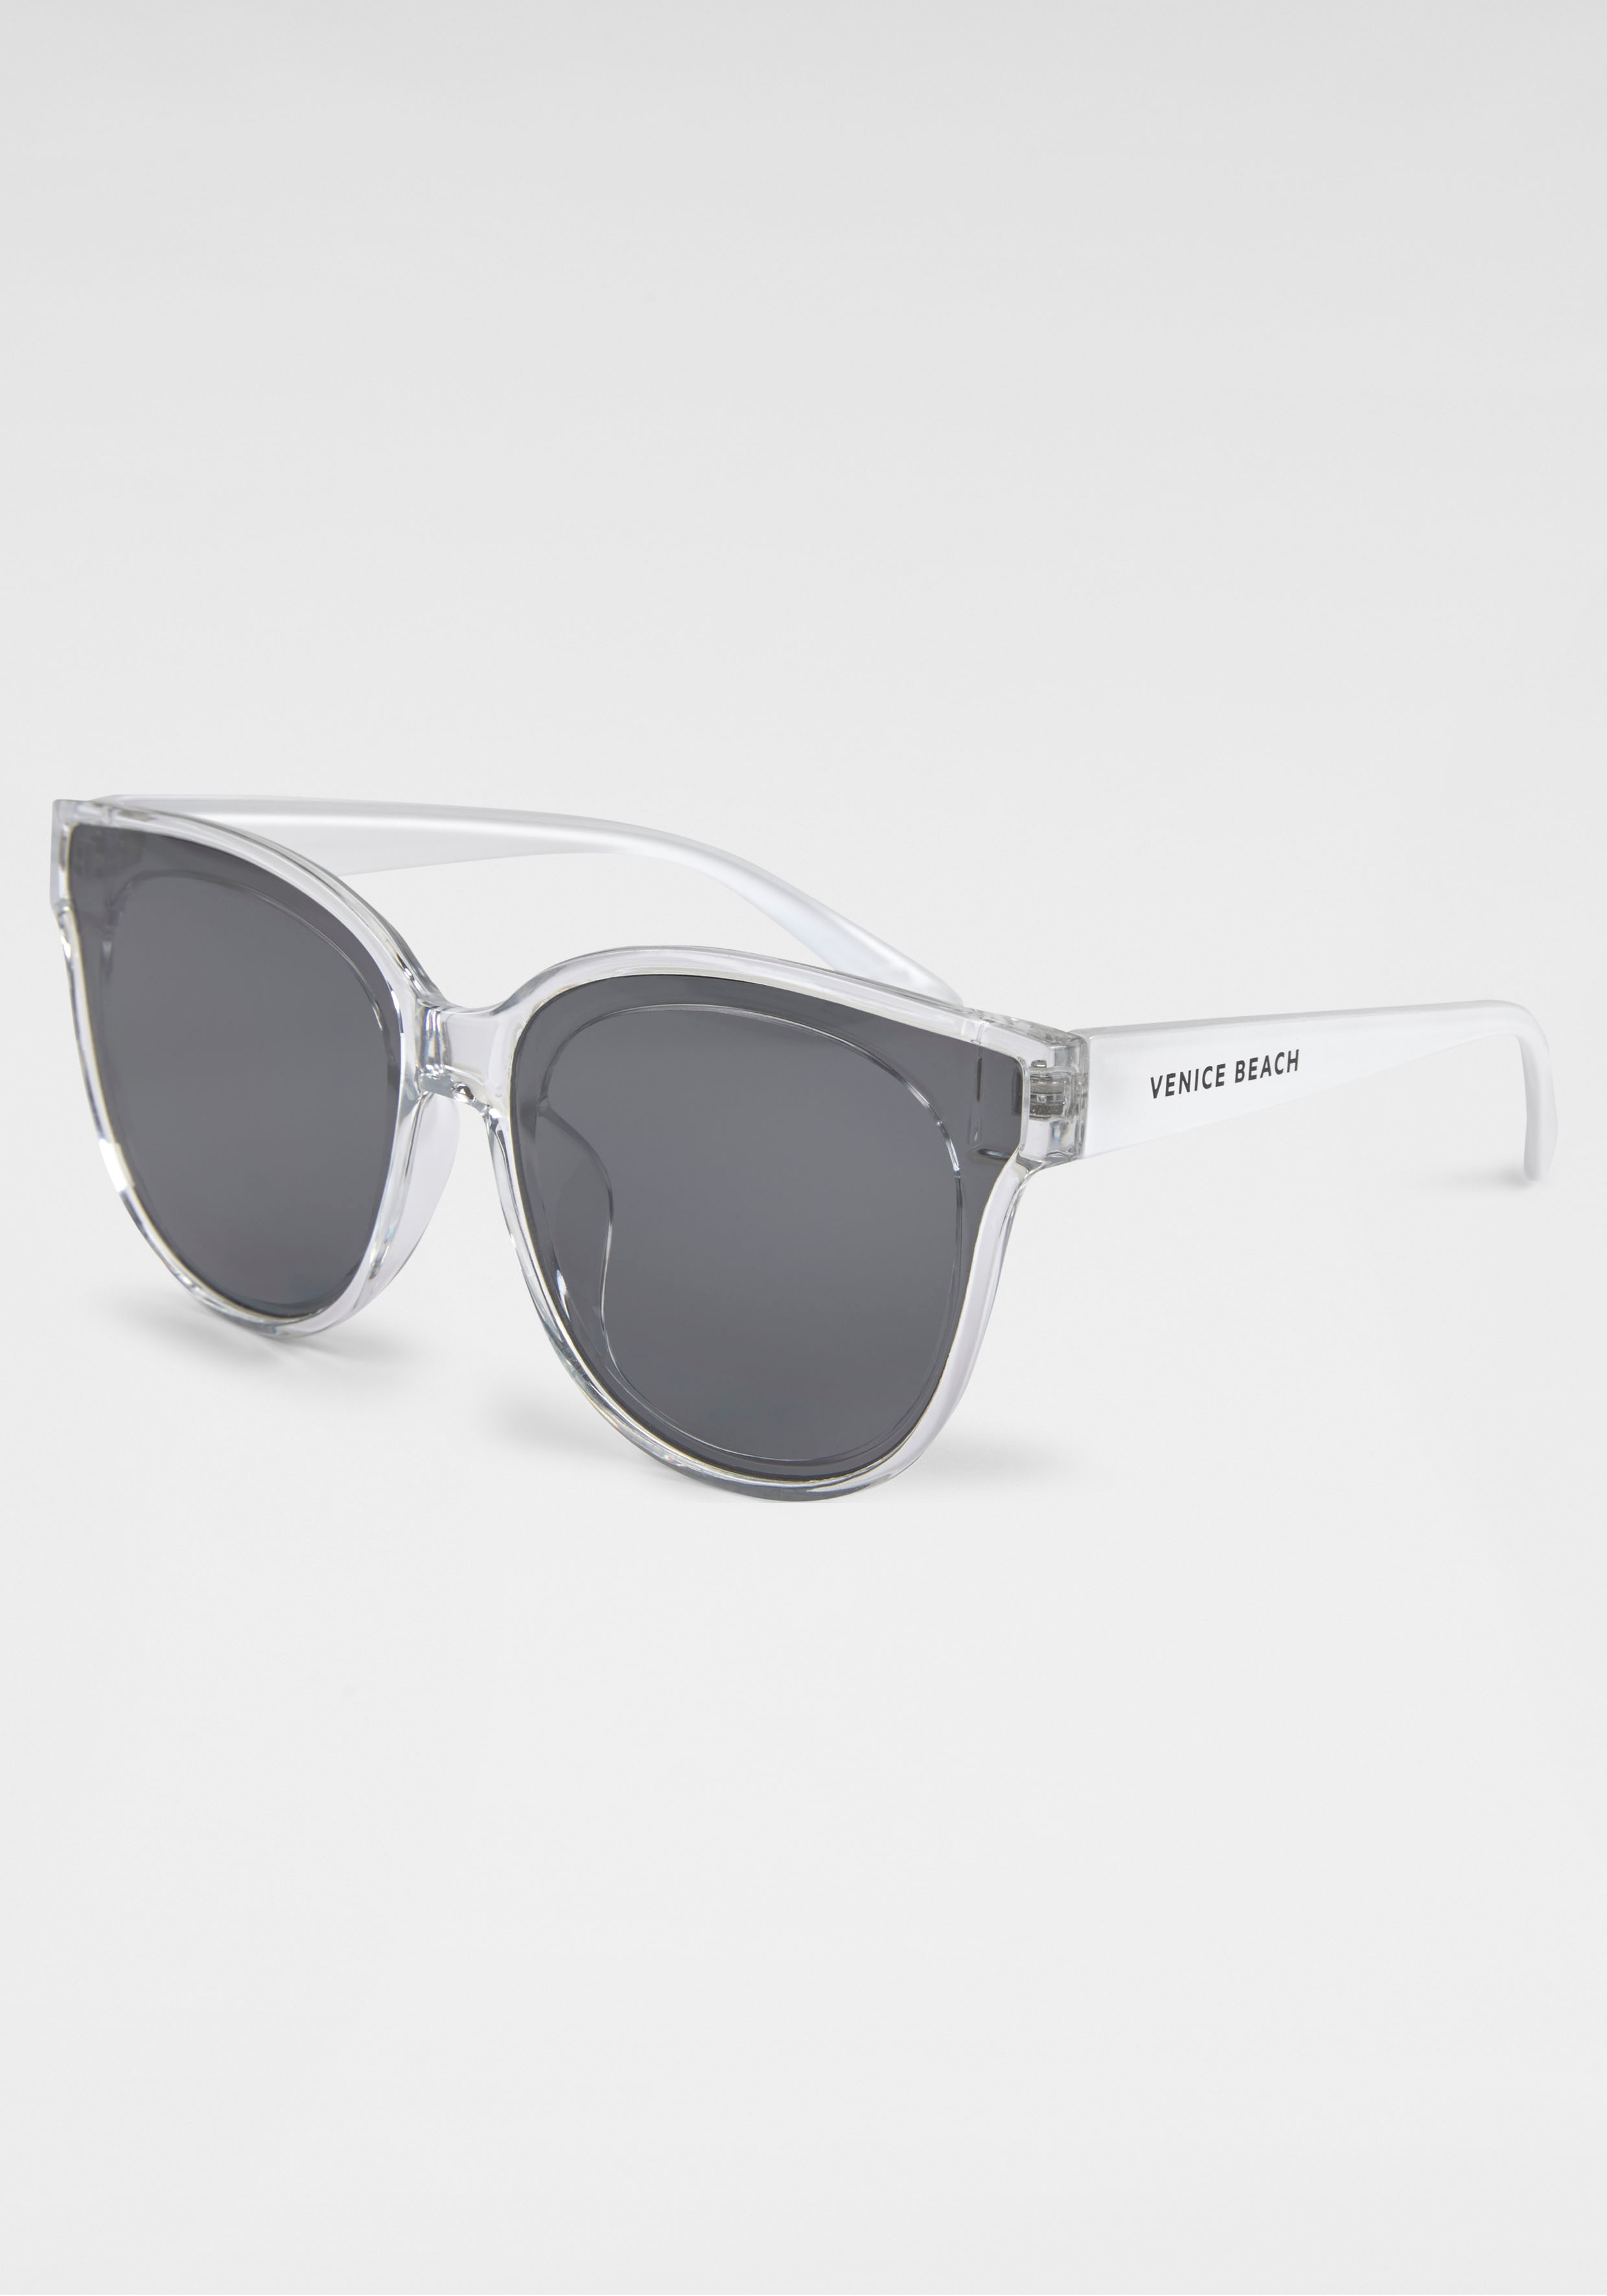 Venice Beach Sonnenbrille, im Cat-Eye Style weiß Damen Ovale Sonnenbrille Sonnenbrillen Accessoires